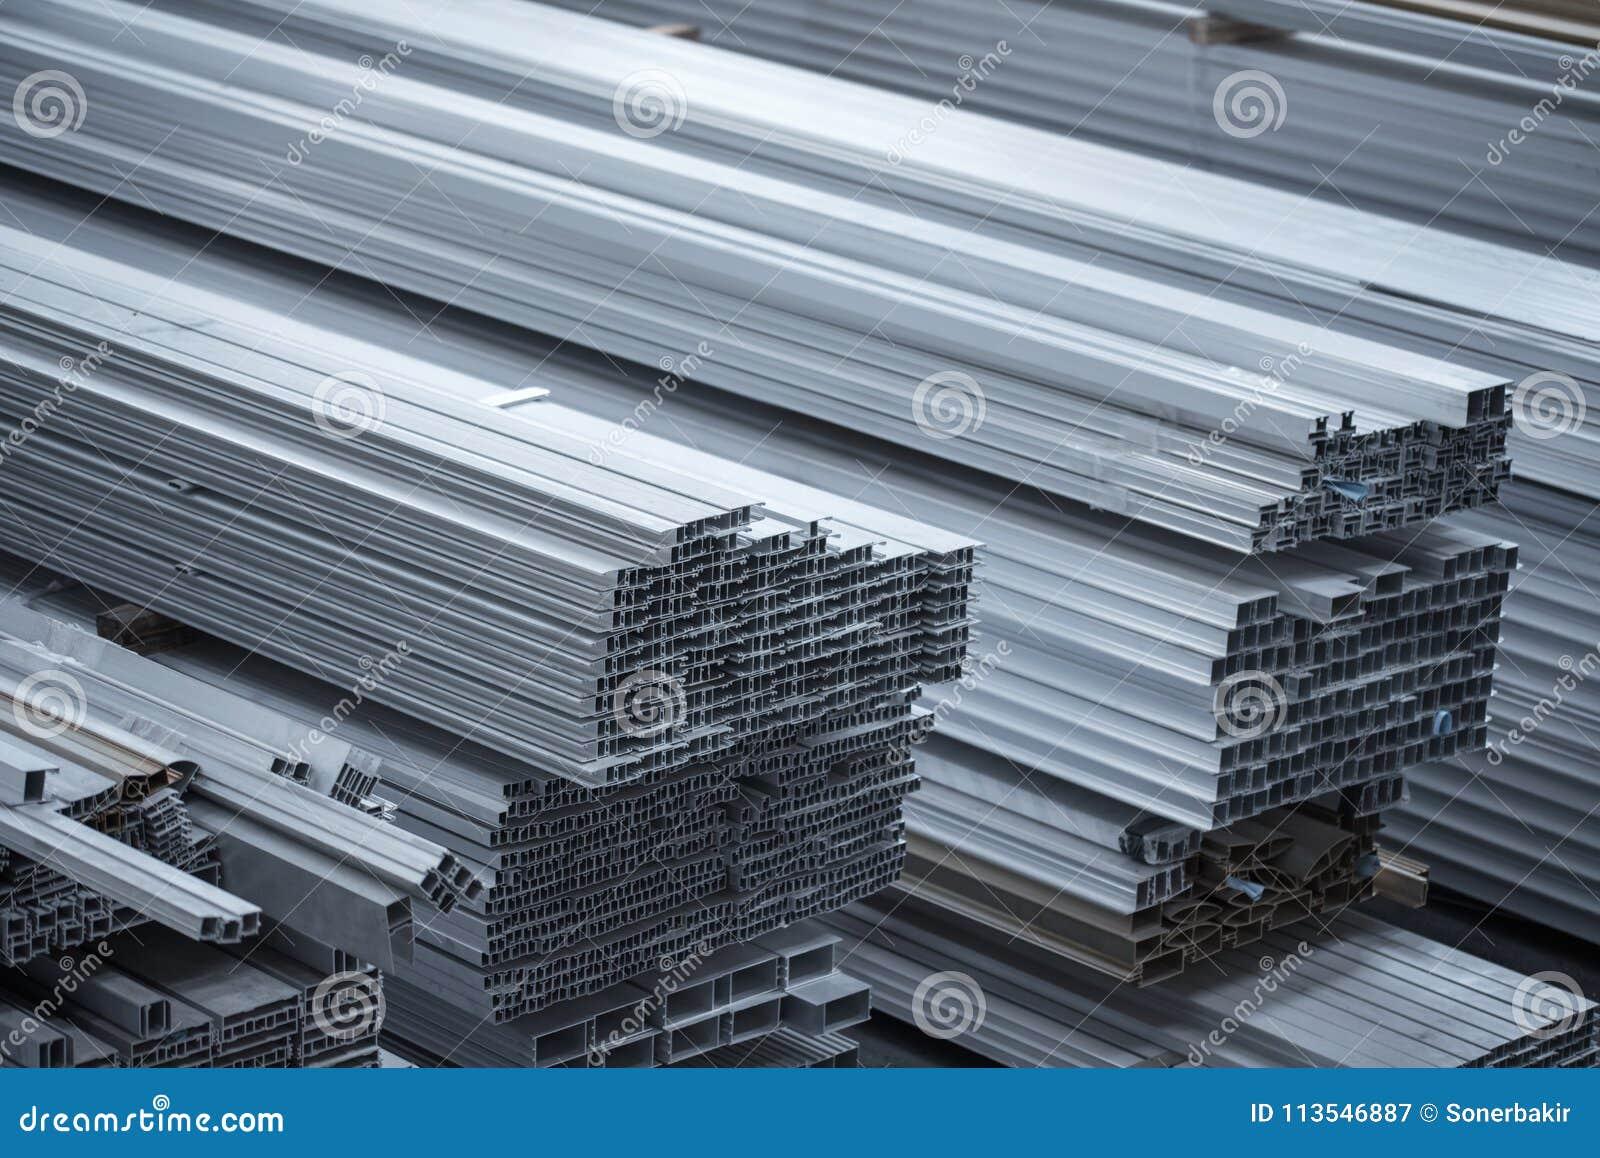 Aluminium Profiles For Constructions  Aluminum Constructions Factory